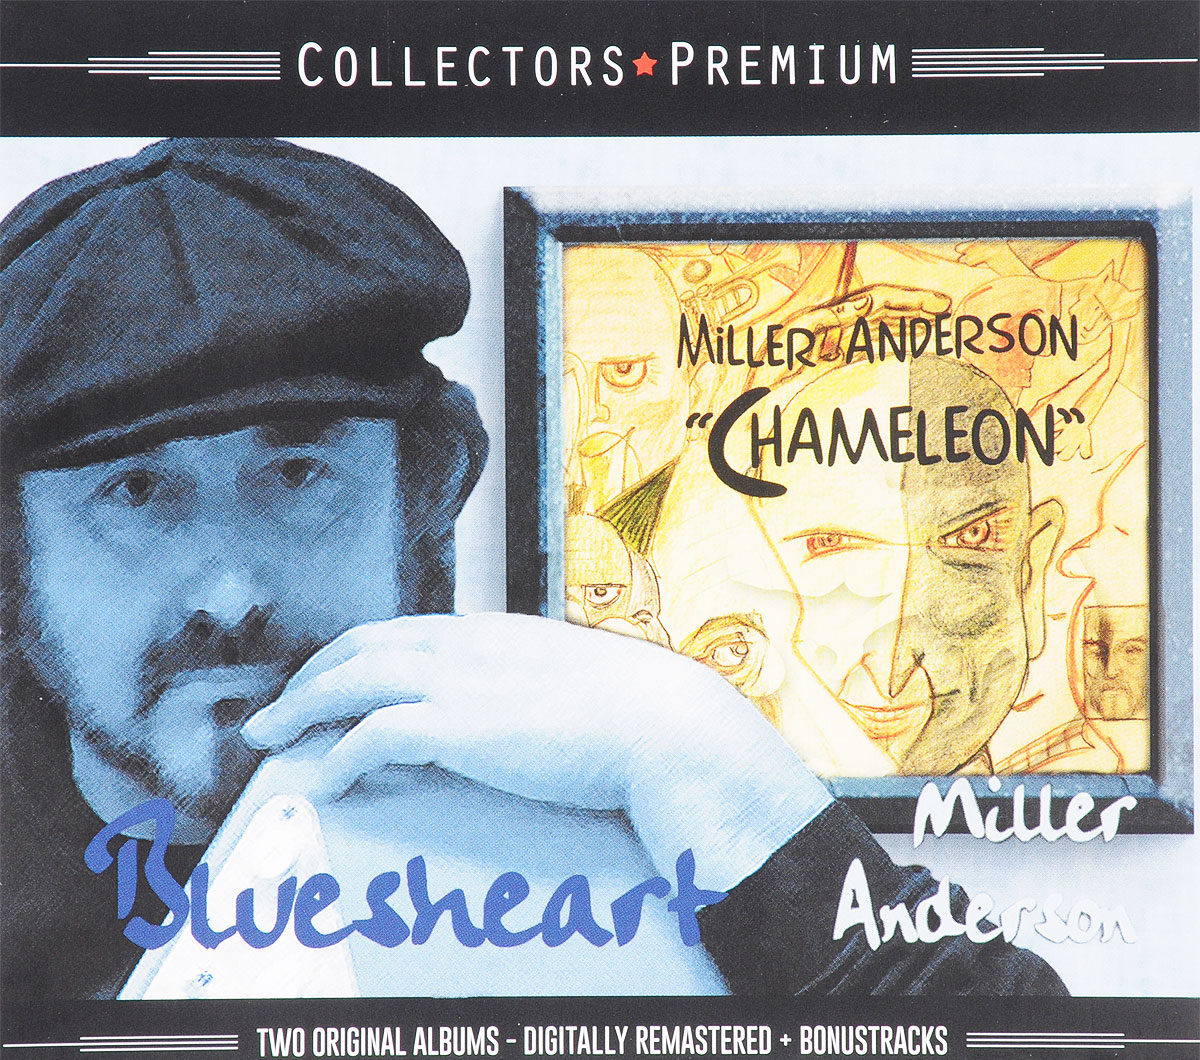 Collectors Premium. Miller Anderson. Bluesheart / Chameleon (2 CD)